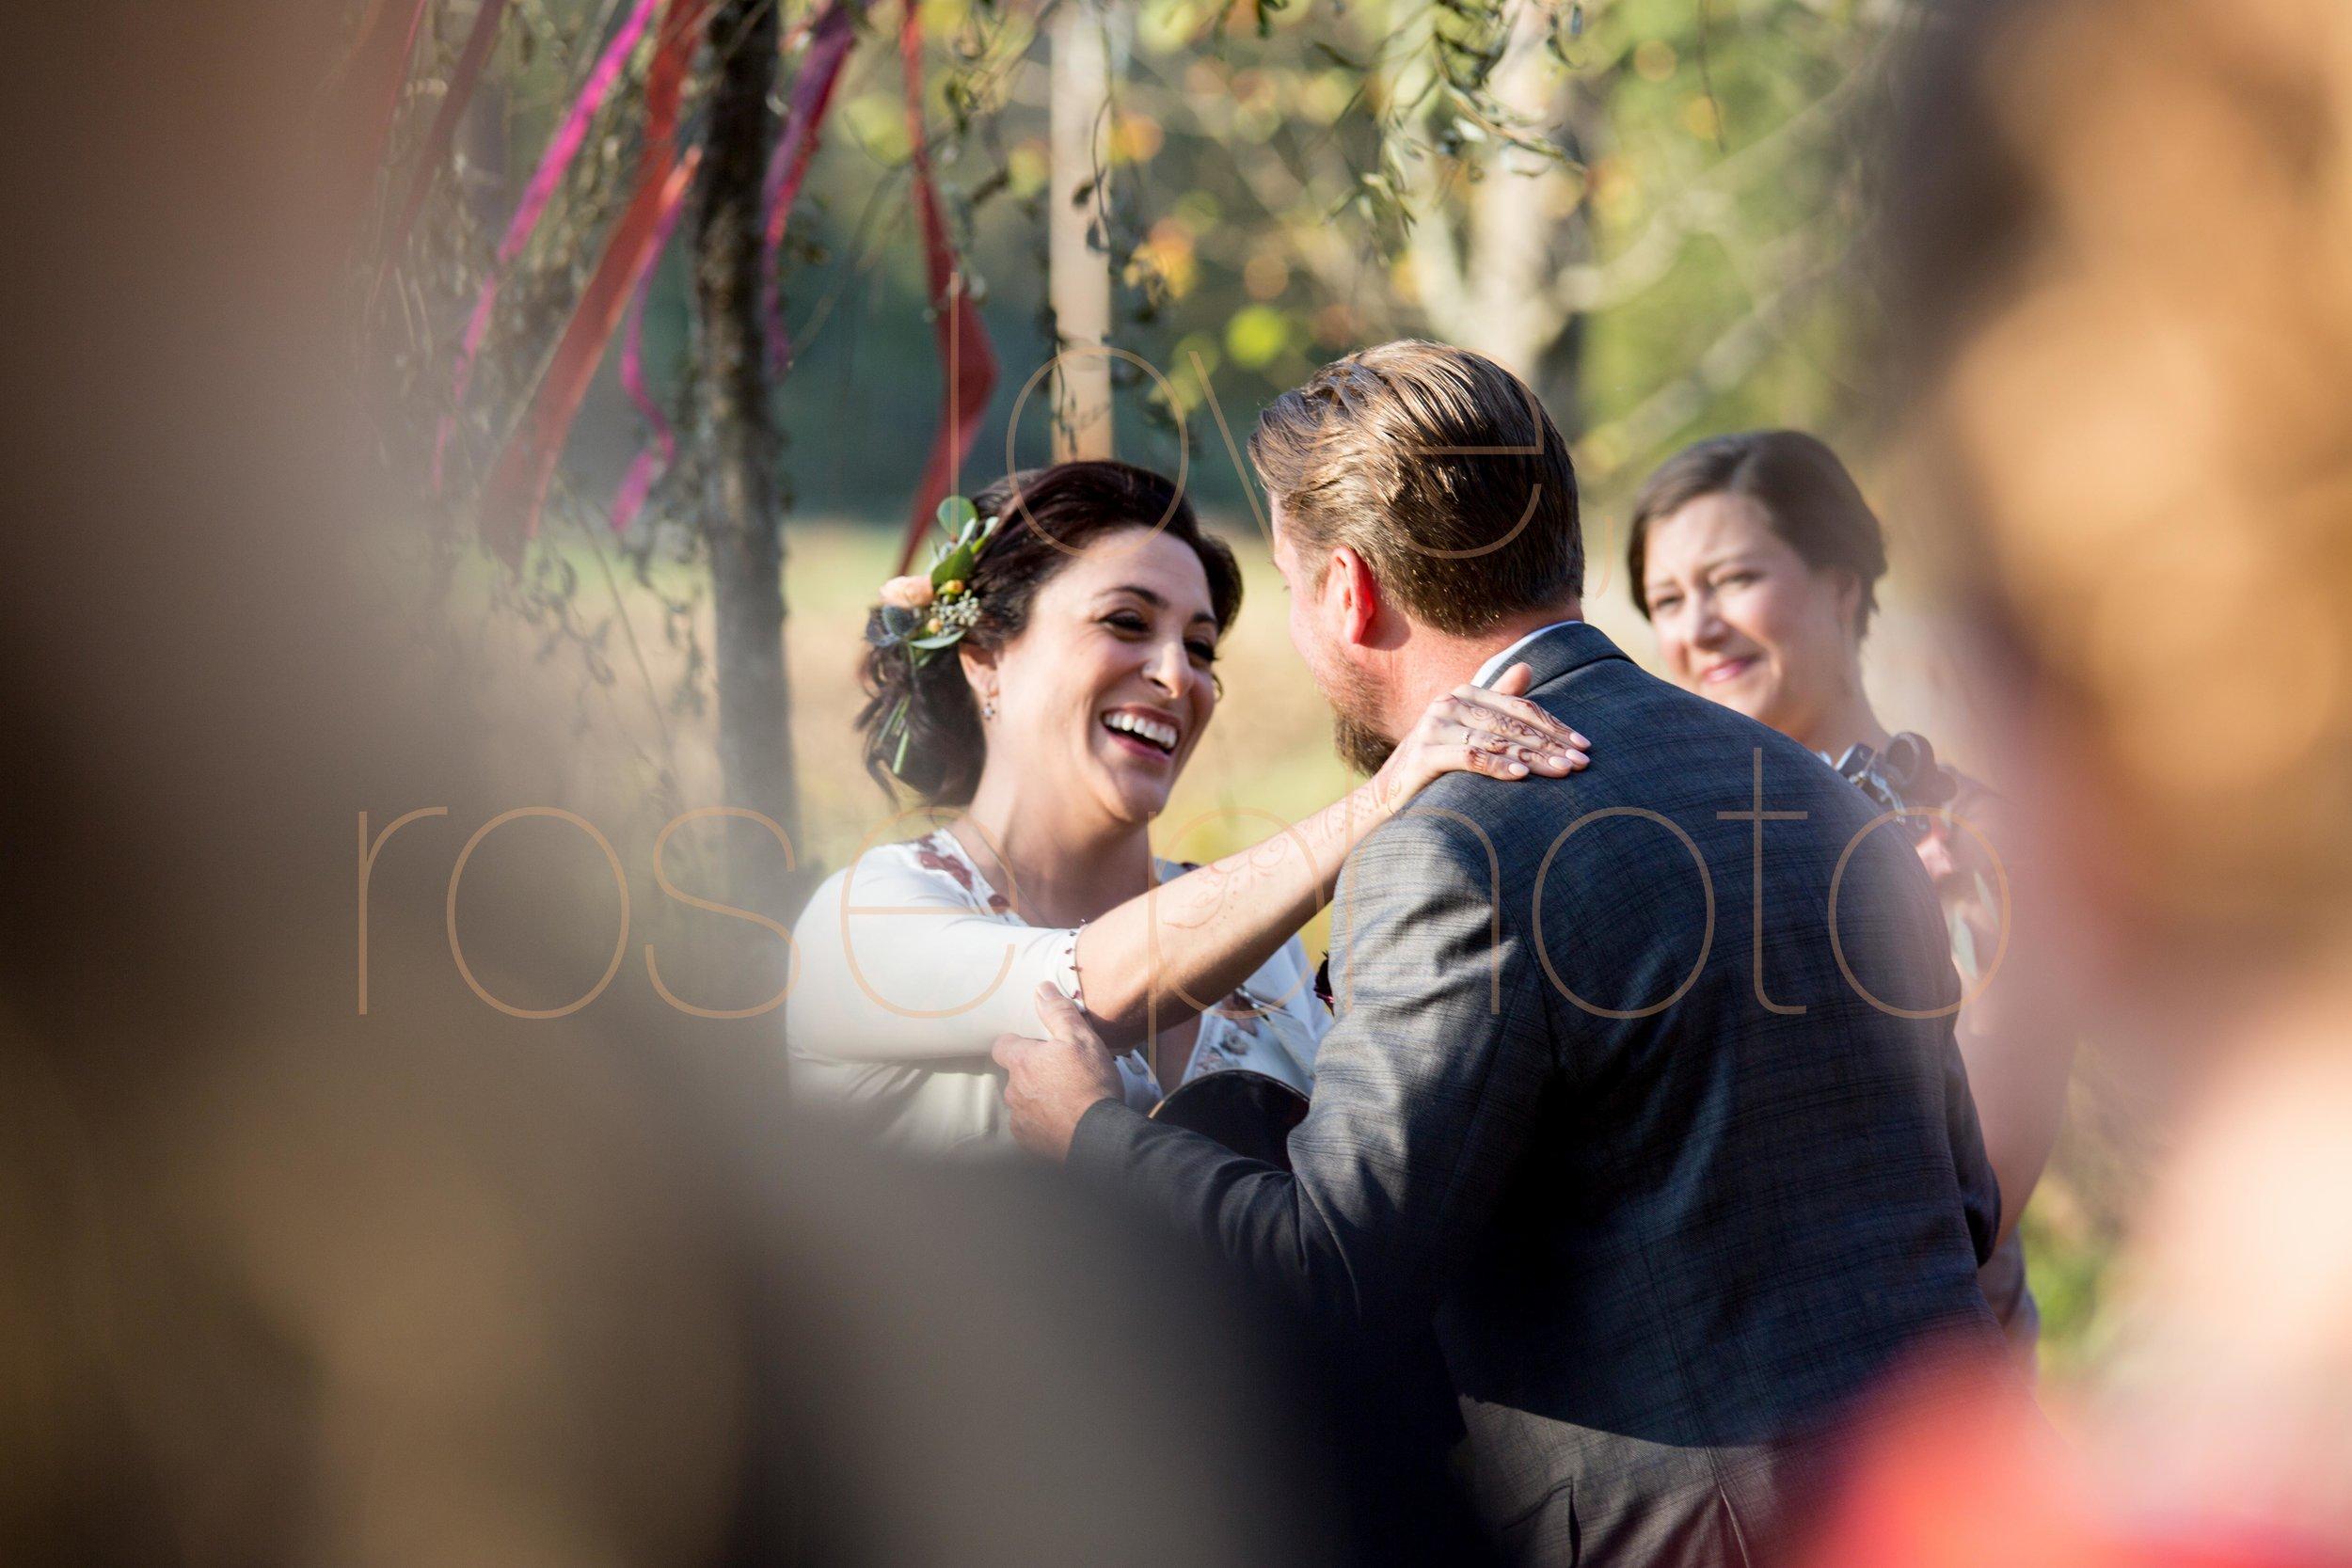 Jane Krame + Jason Ashevegas married asheville best wedding photographers -47.jpg